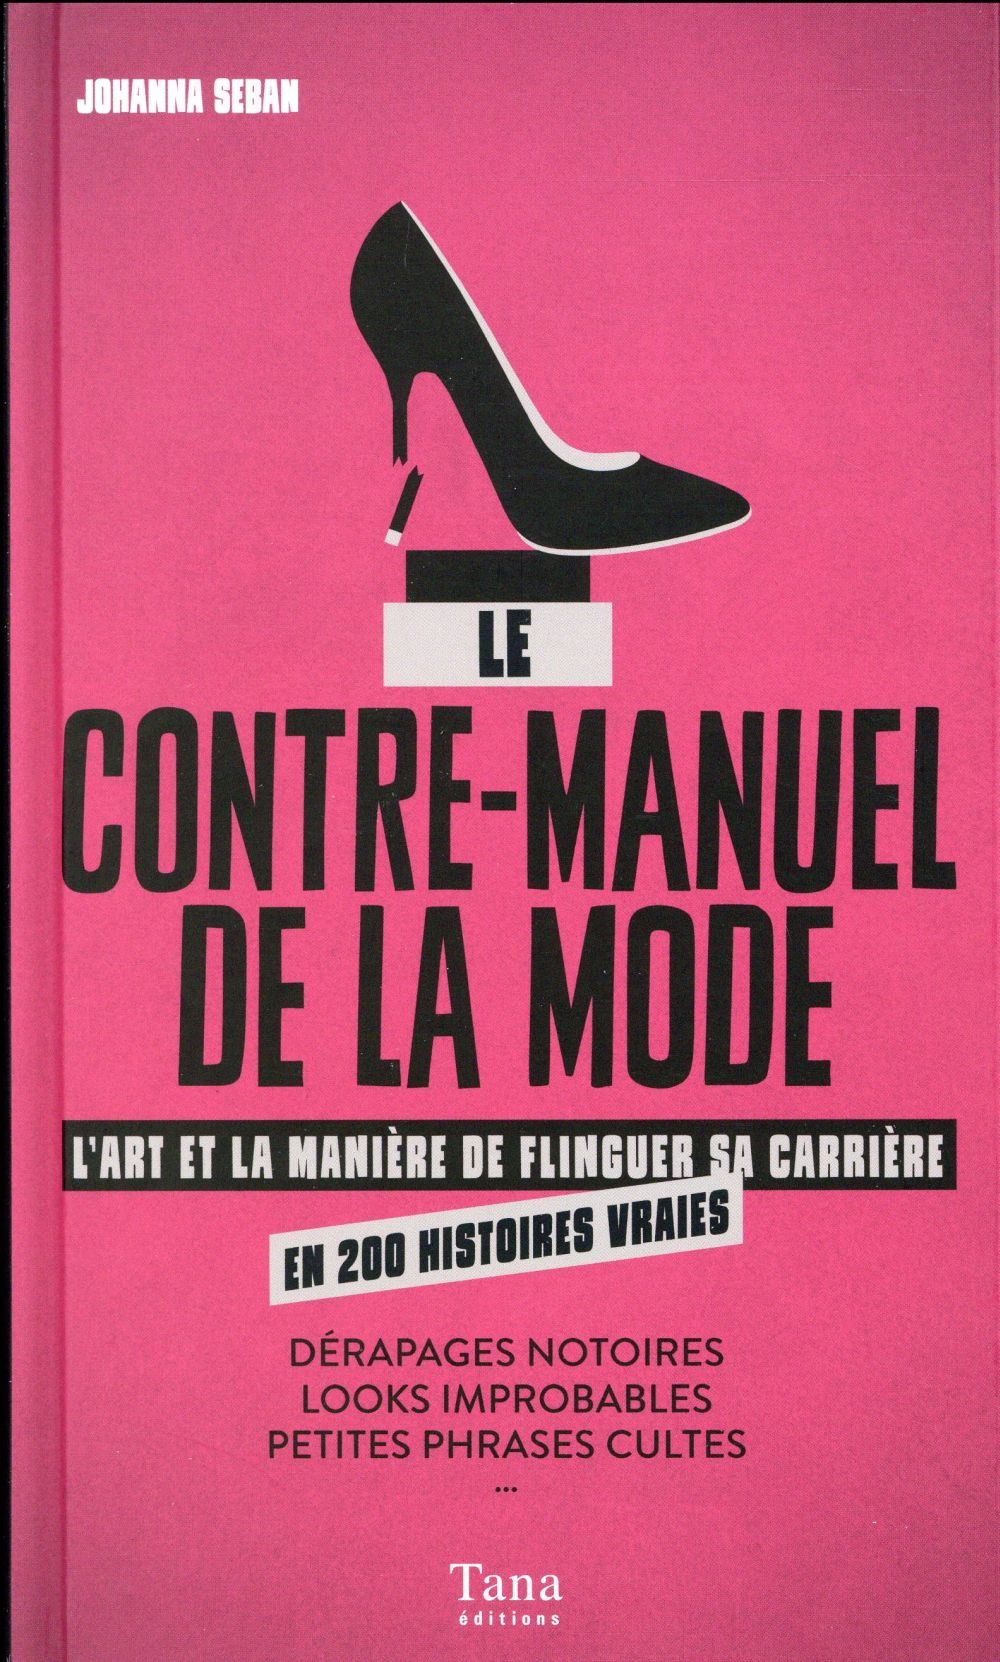 Contre-manuel de la mode